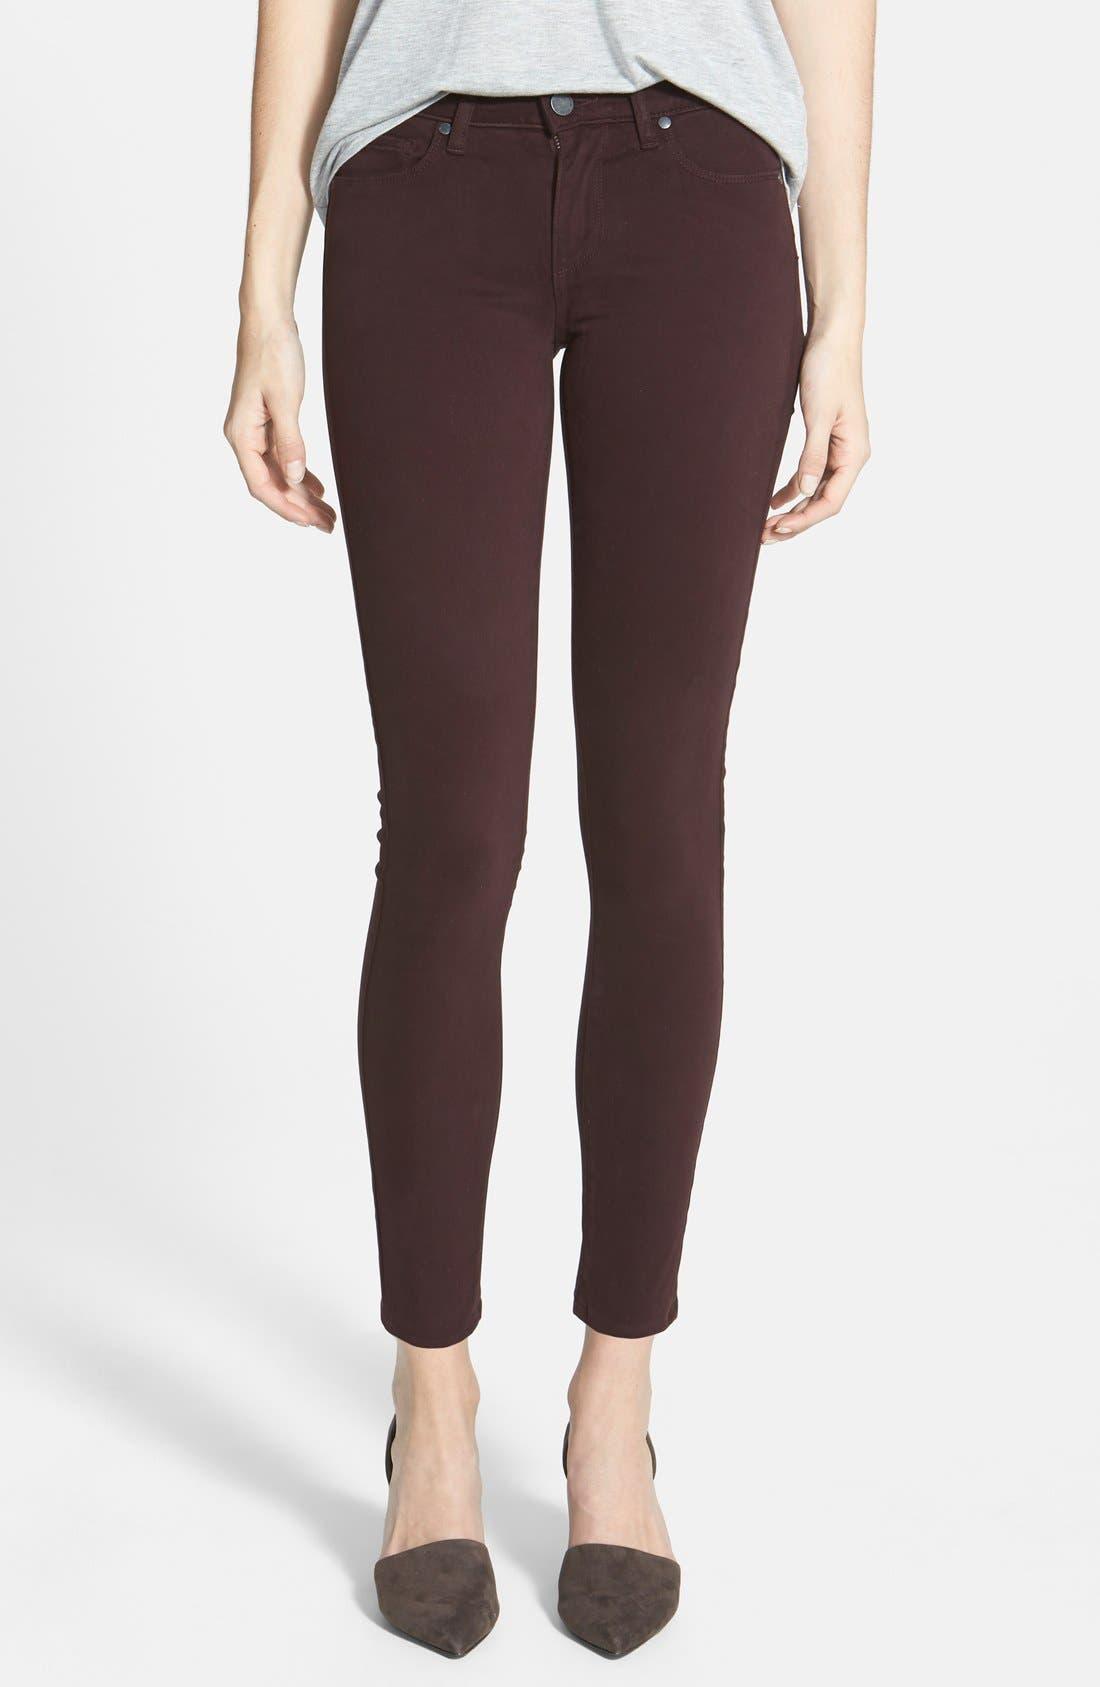 Alternate Image 1 Selected - Paige Denim 'Verdugo' Ultra Skinny Jeans (Dark Wine)